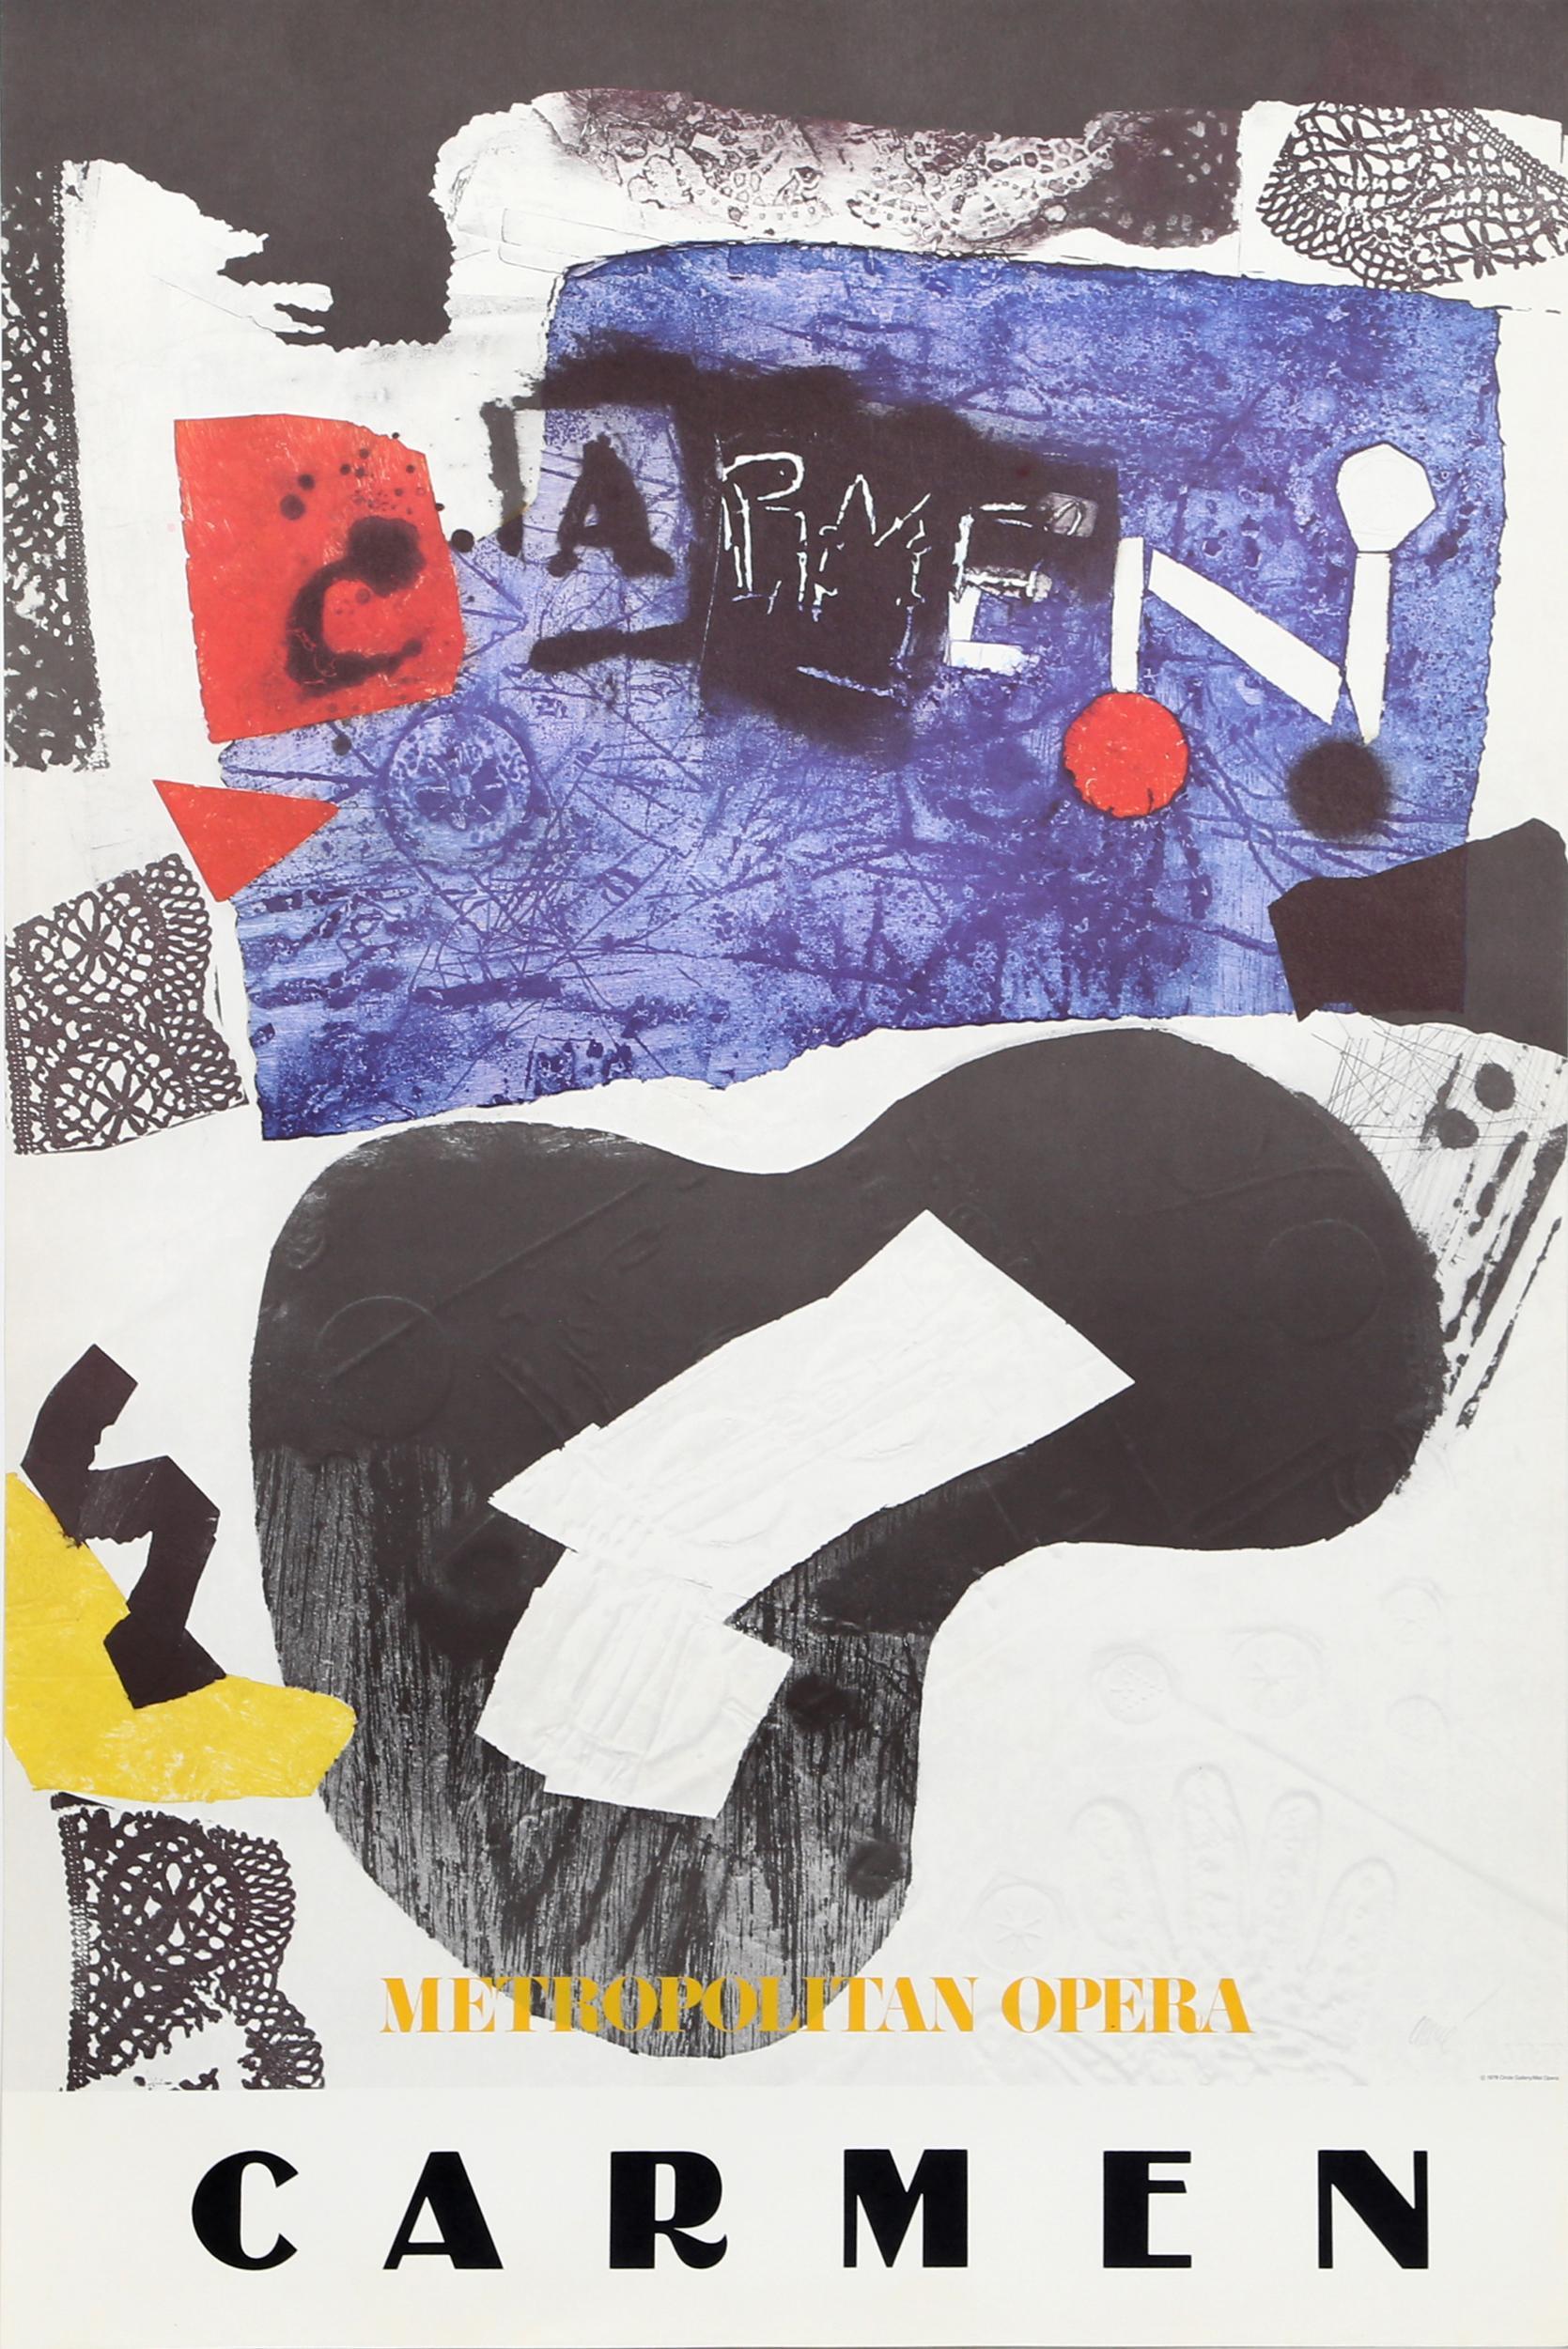 Antoni Clave, Metropolitan Opera - Carmen, Poster